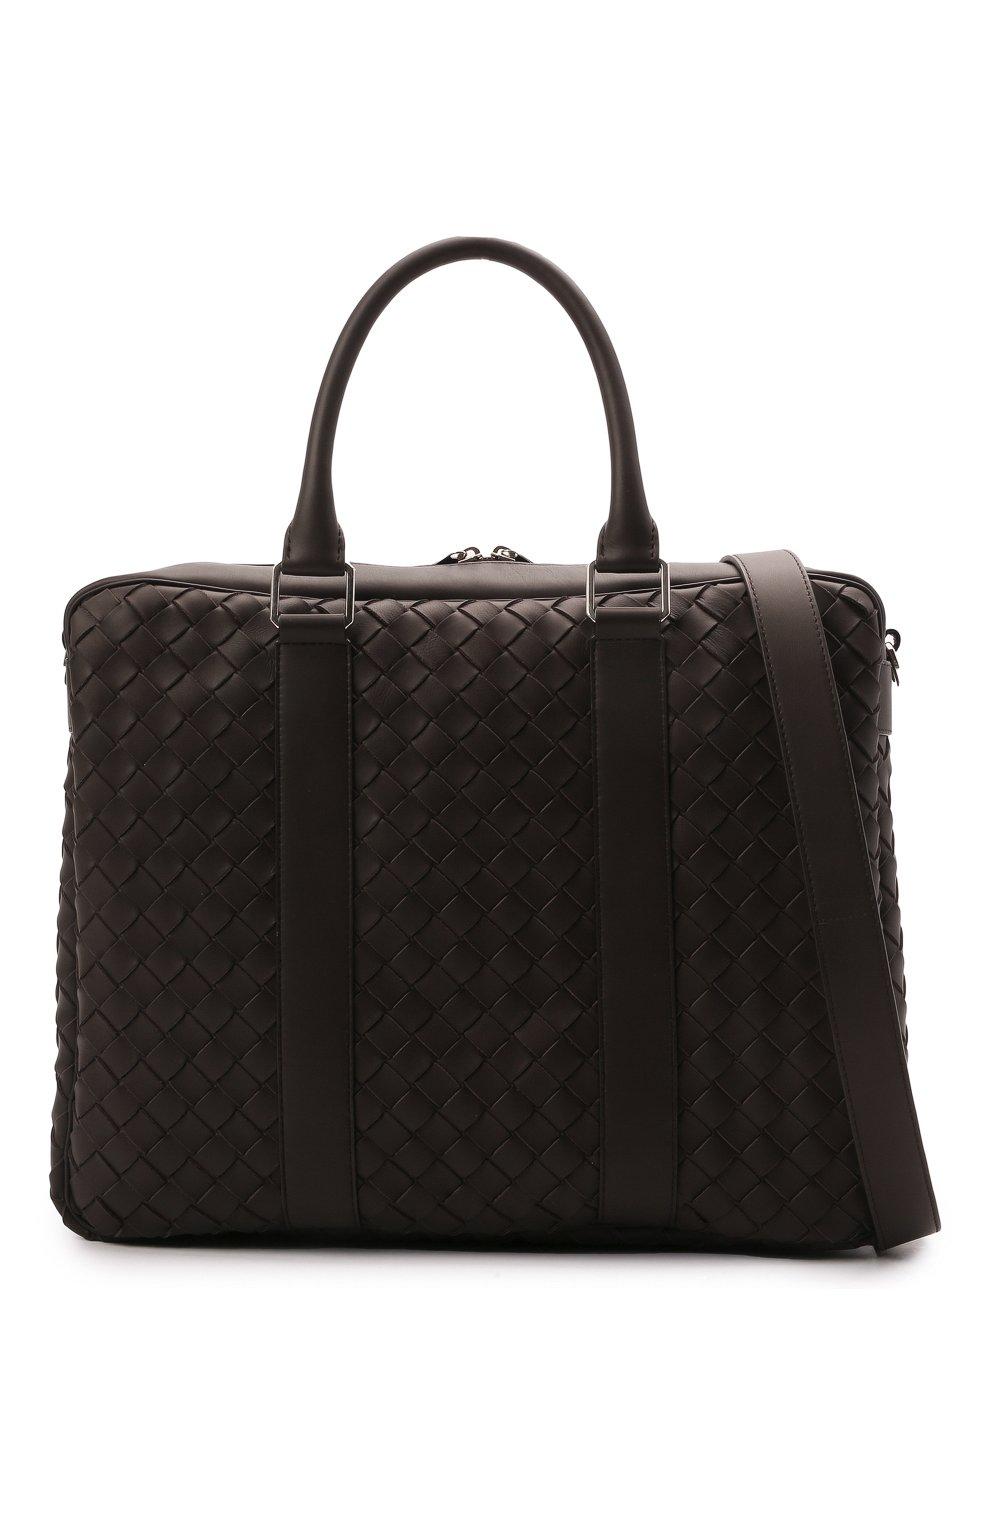 Мужская кожаная сумка для ноутбука BOTTEGA VENETA темно-коричневого цвета, арт. 650372/V0E51 | Фото 5